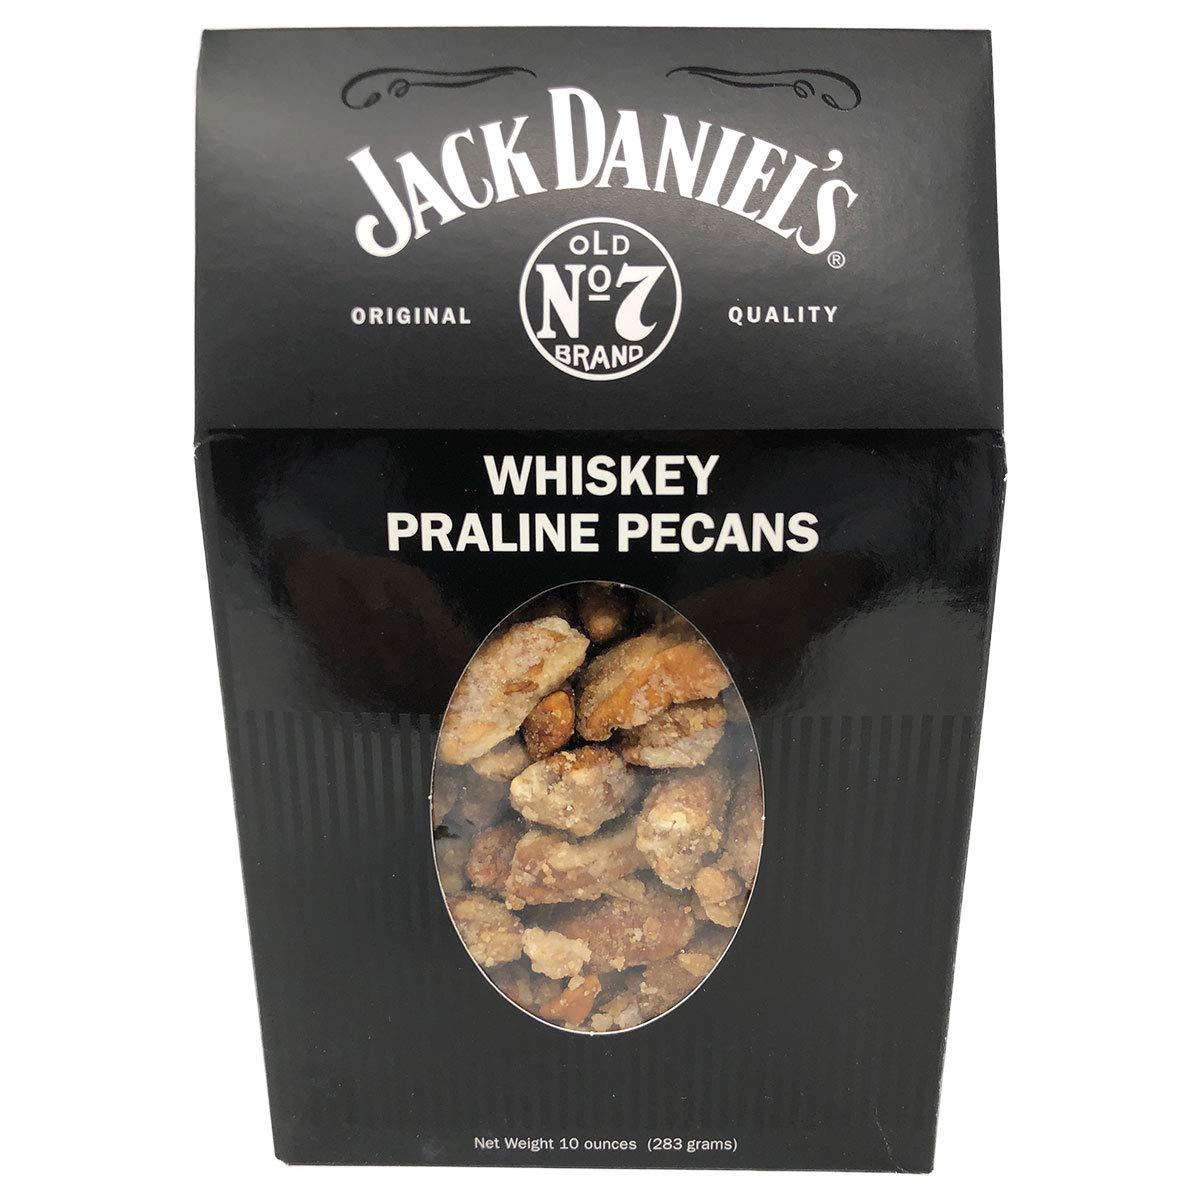 Jack Daniel's Whiskey Praline Pecans - 10 Ounce by Jack Daniels